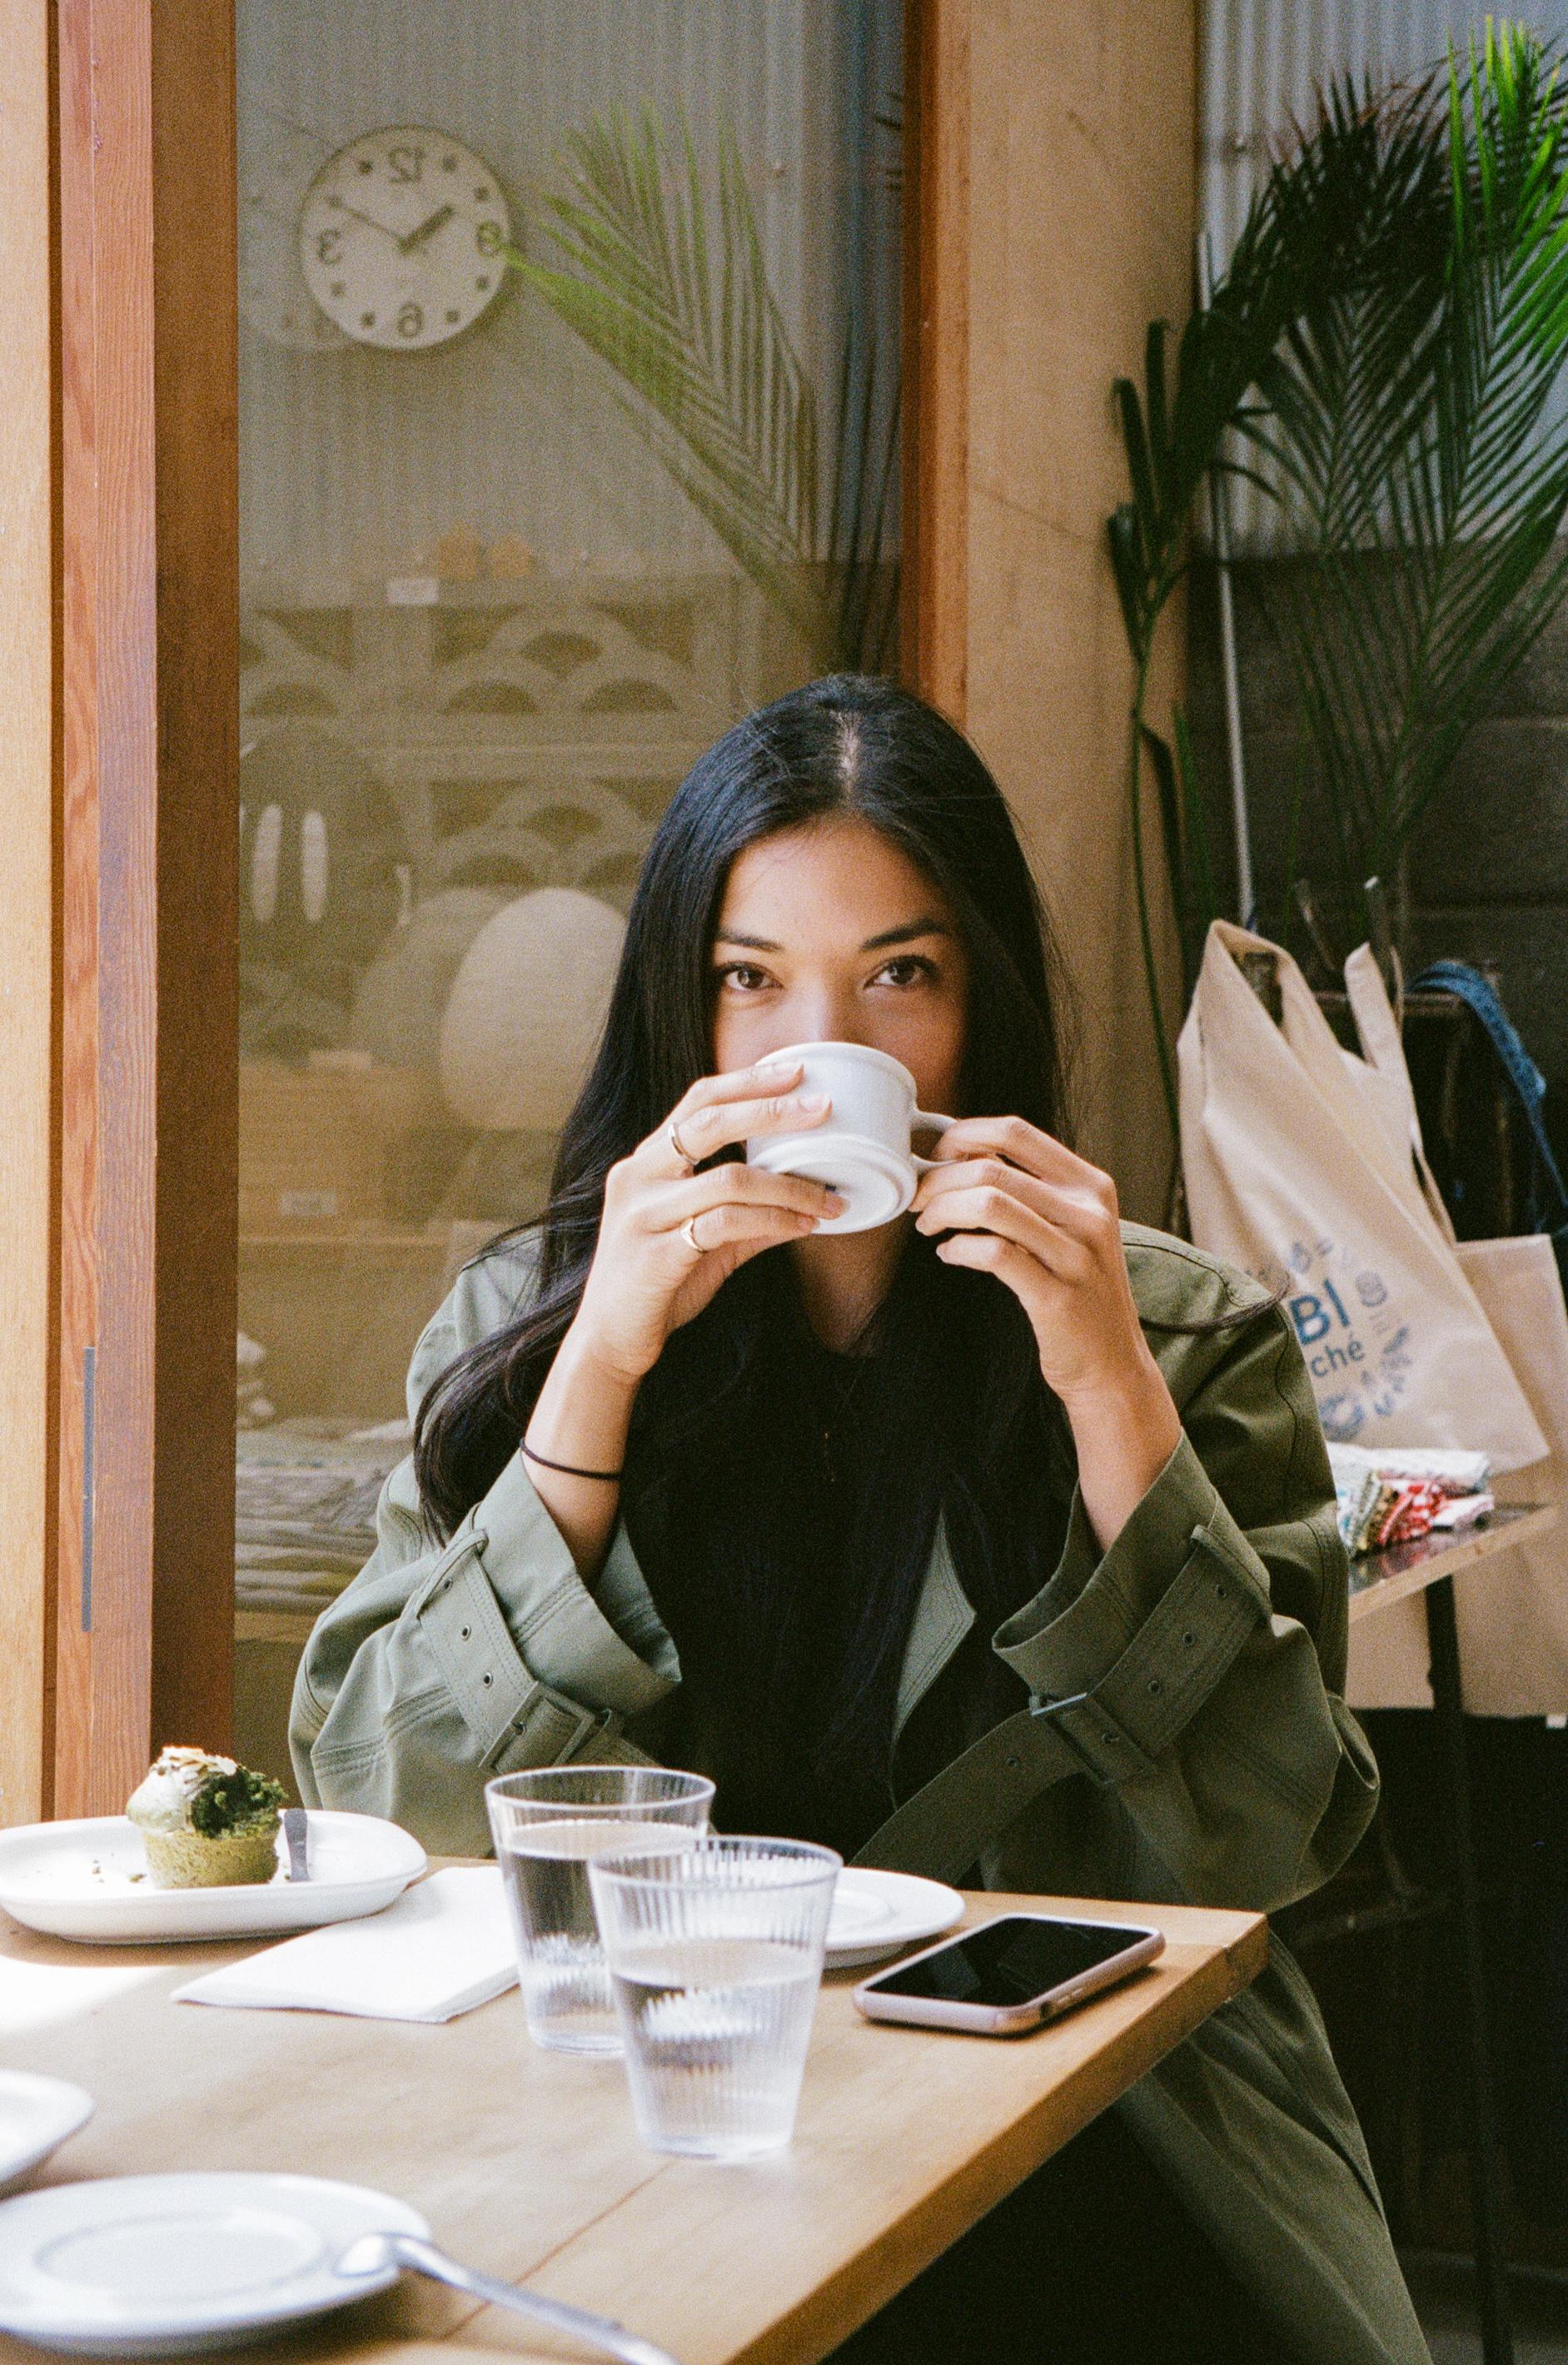 Japan_35mm-44.jpg